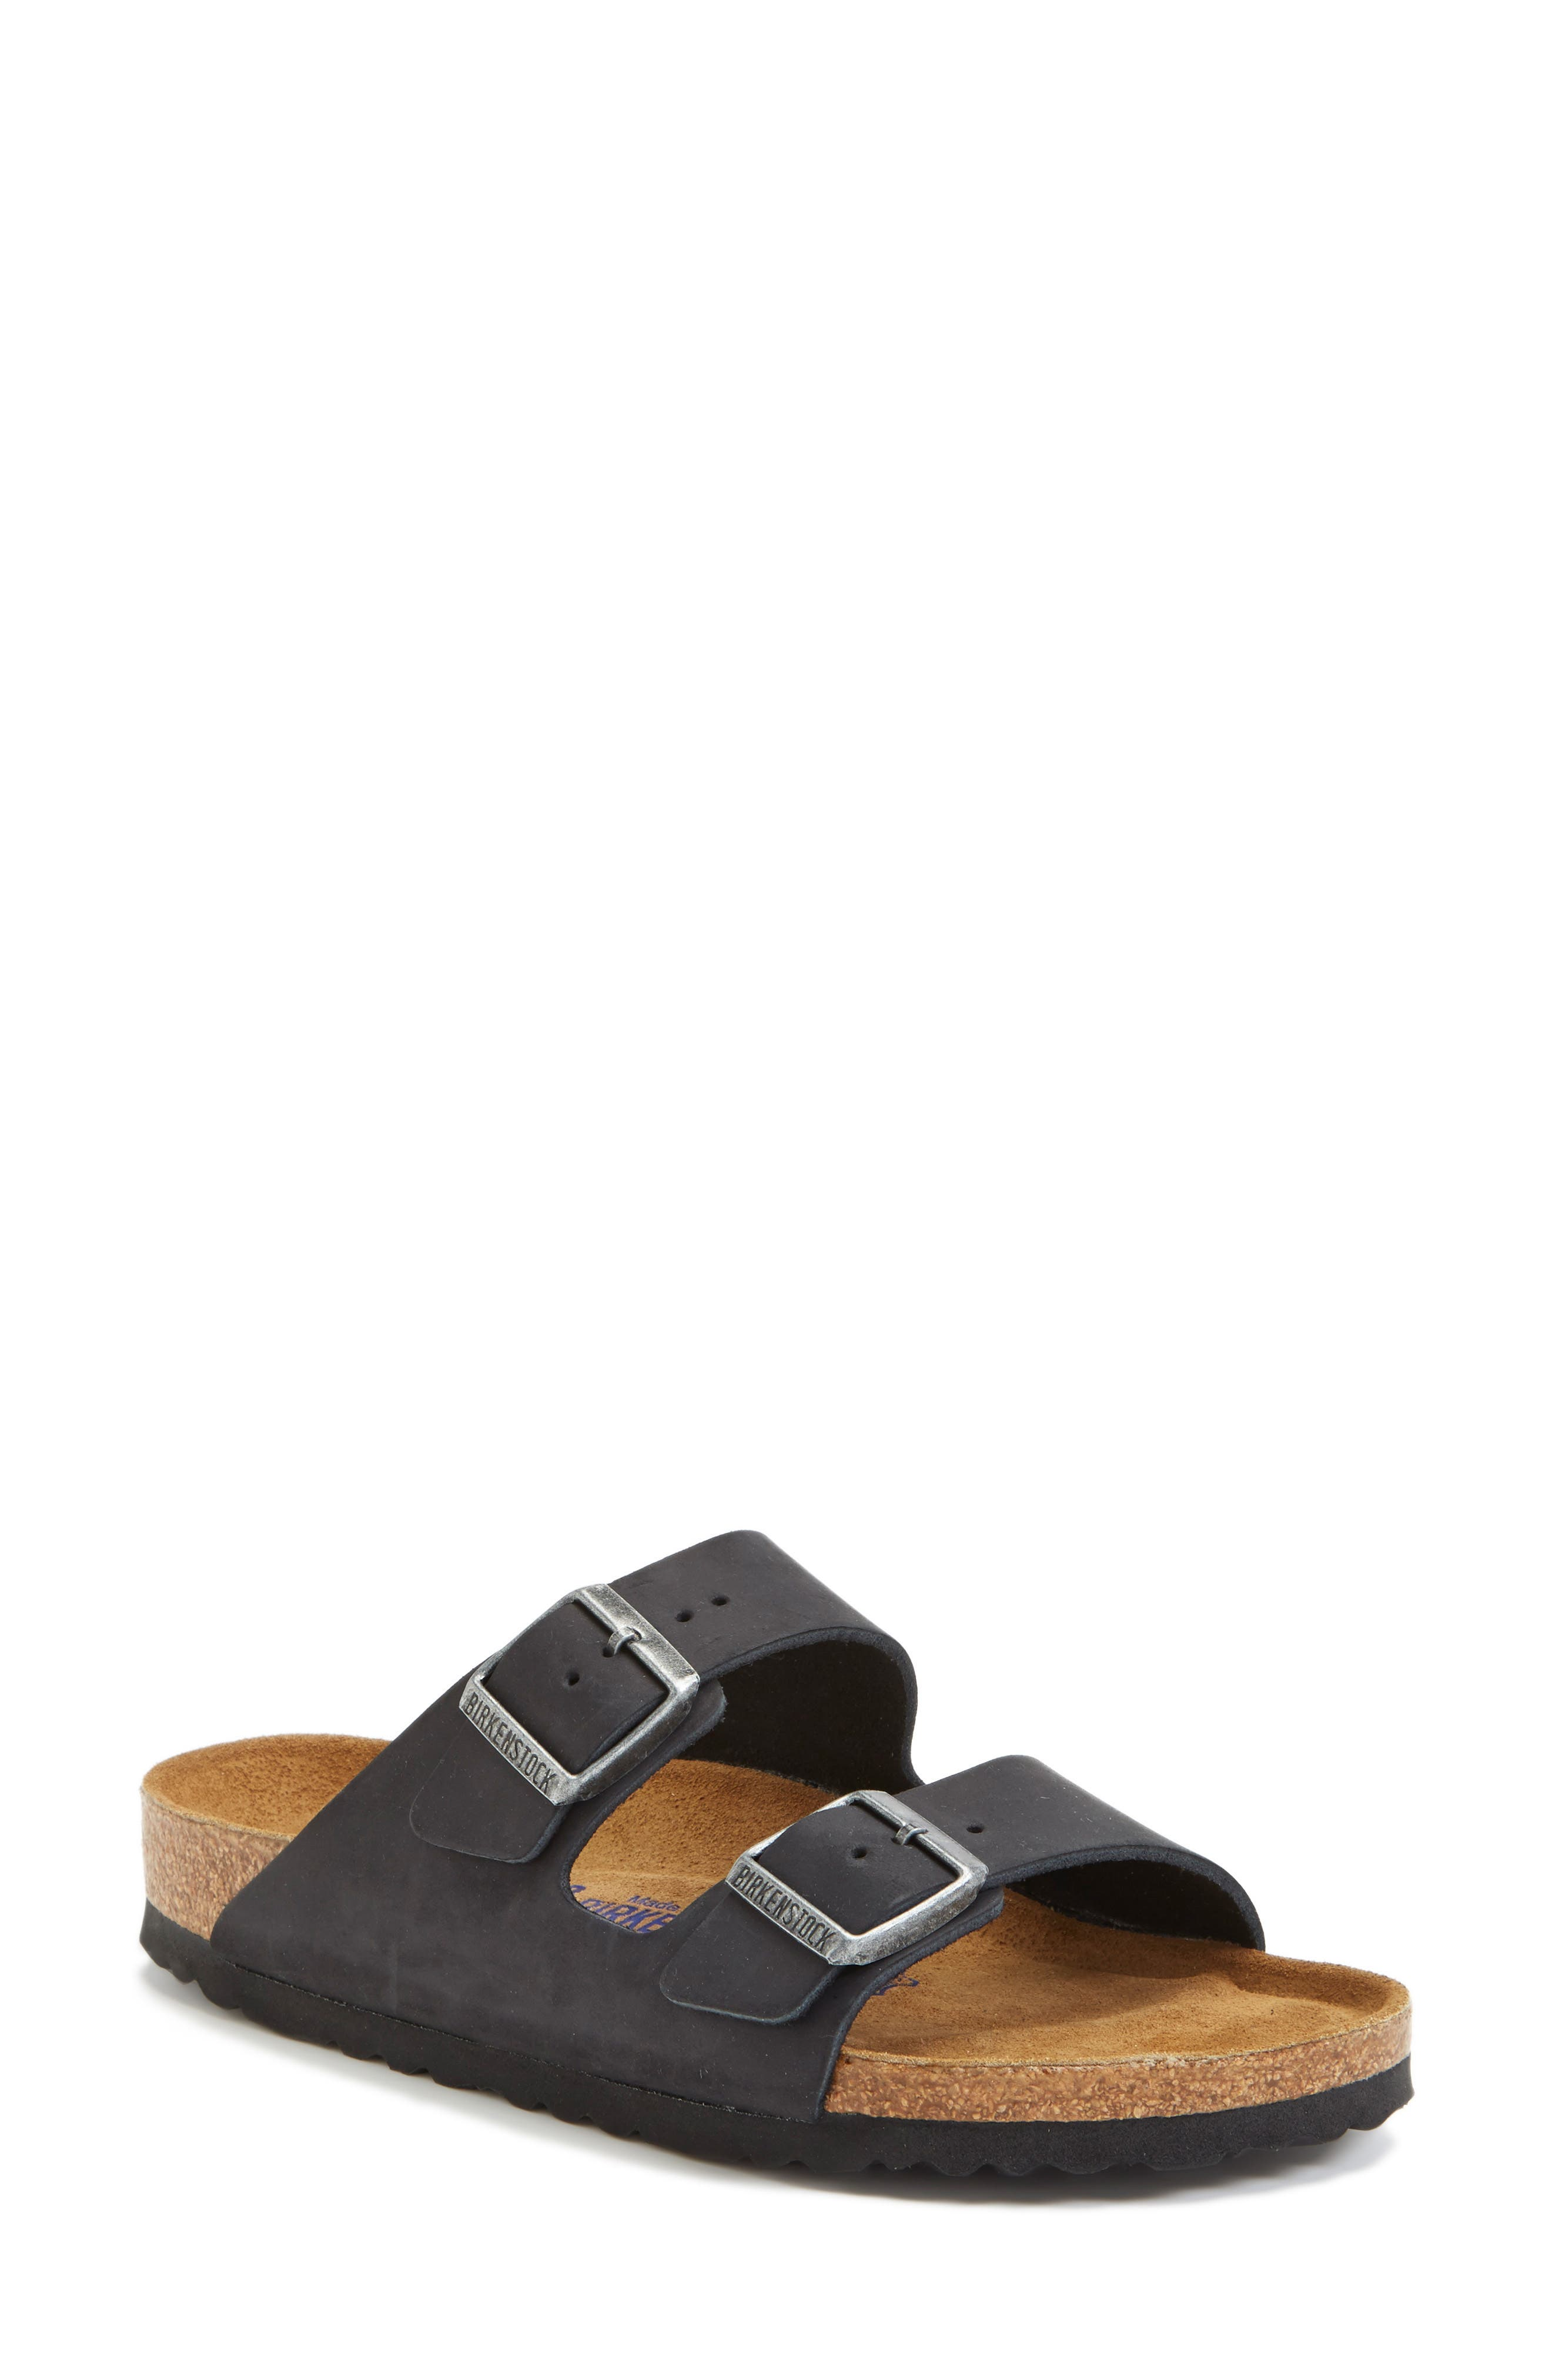 'Arizona' Soft Footbed Sandal,                         Main,                         color, Black/ Black